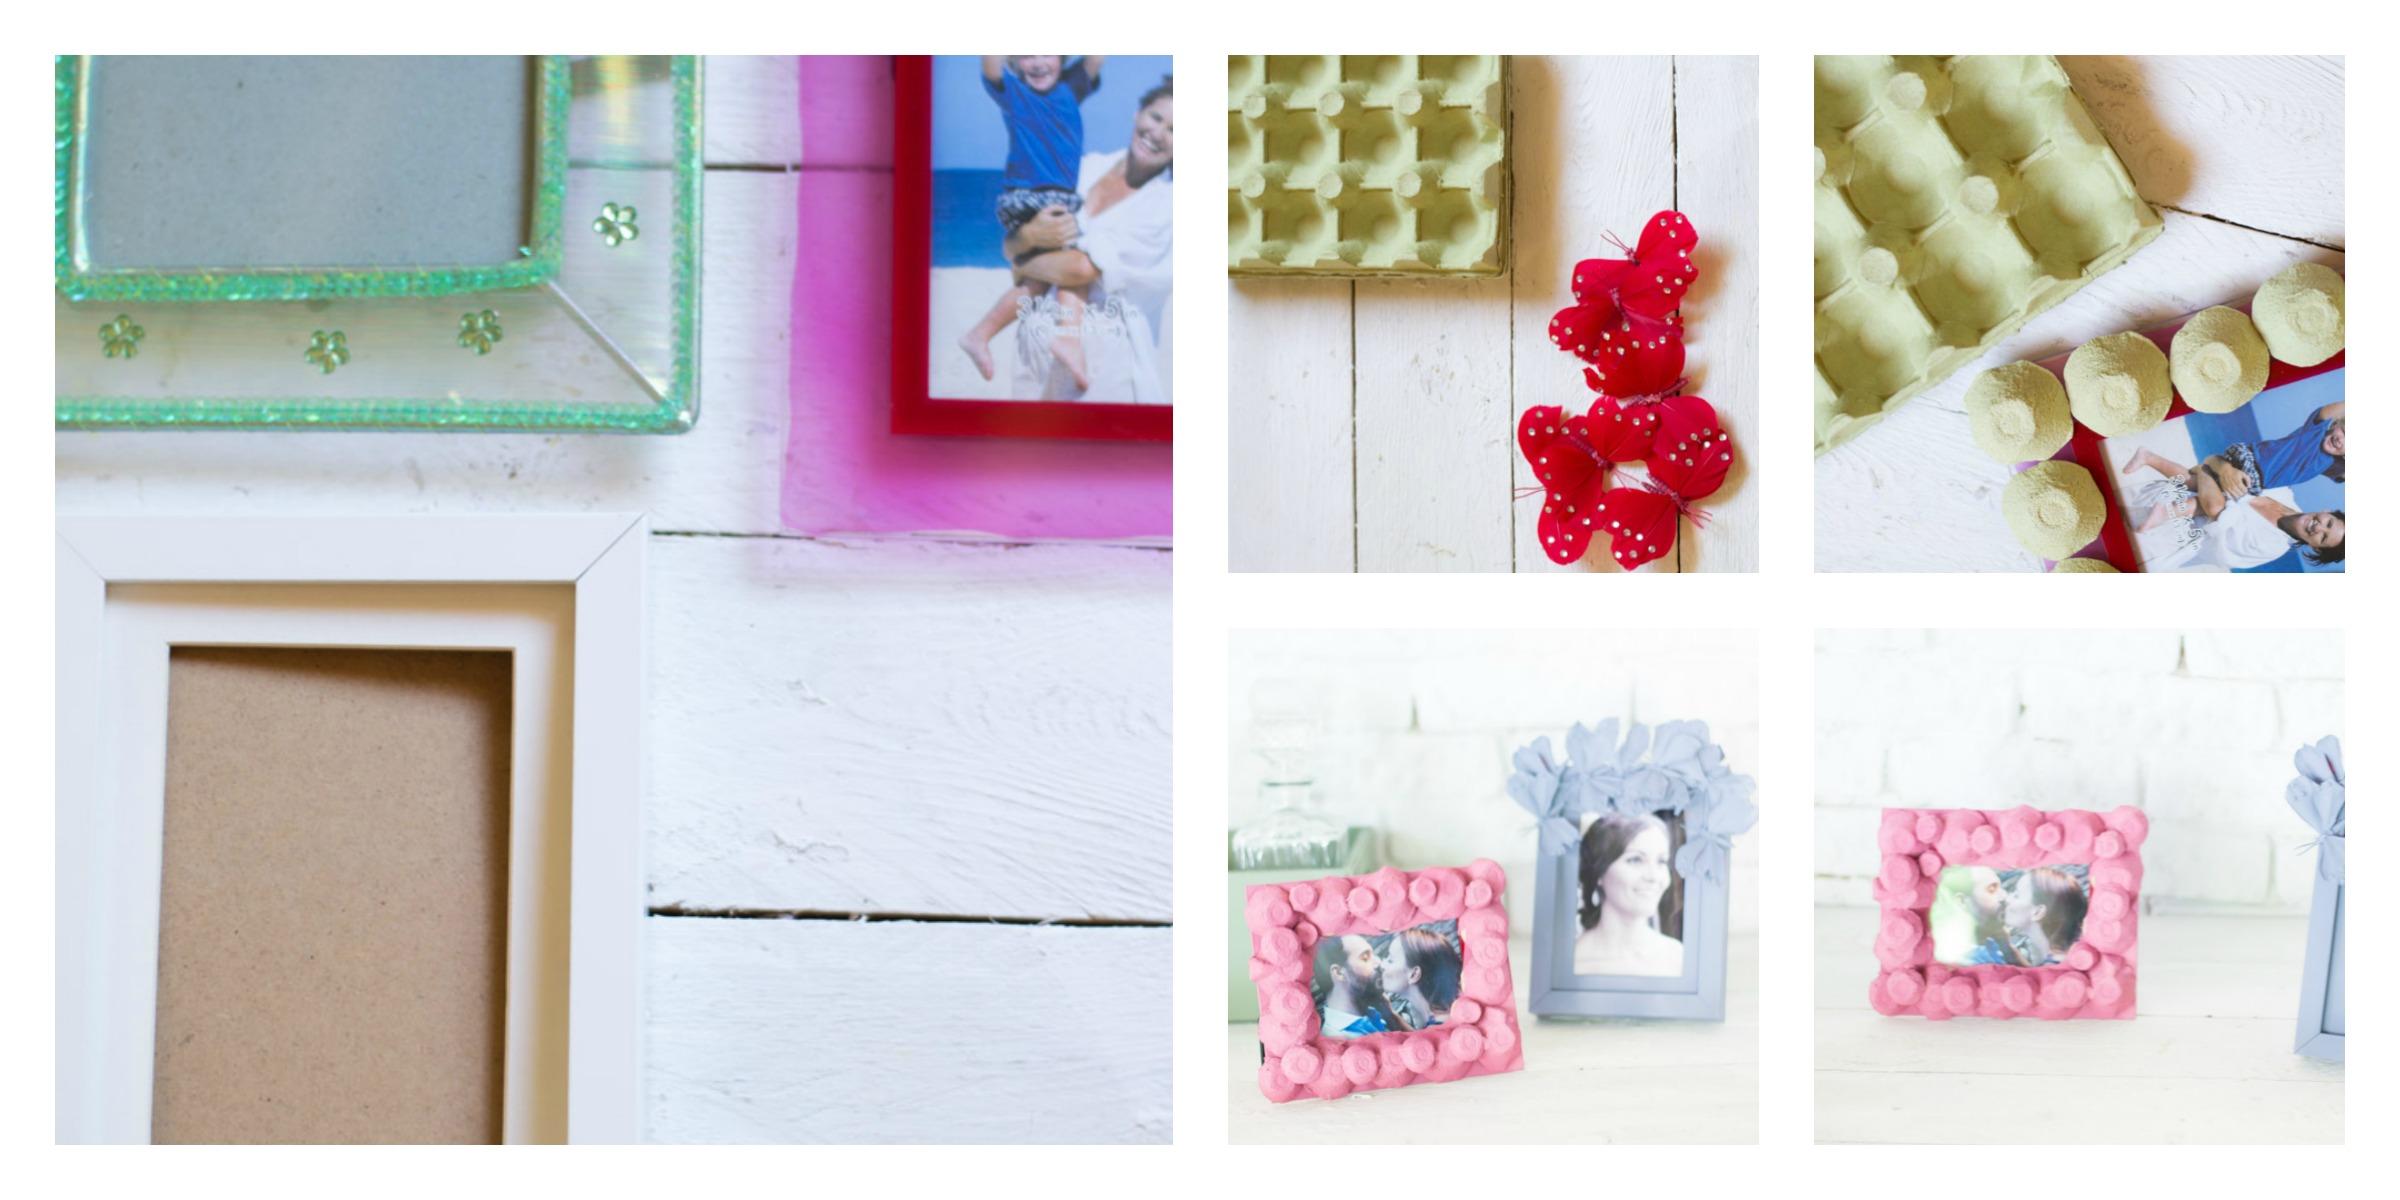 Decorar reciclando objetos trendy como with decorar - Decorar reciclando objetos ...